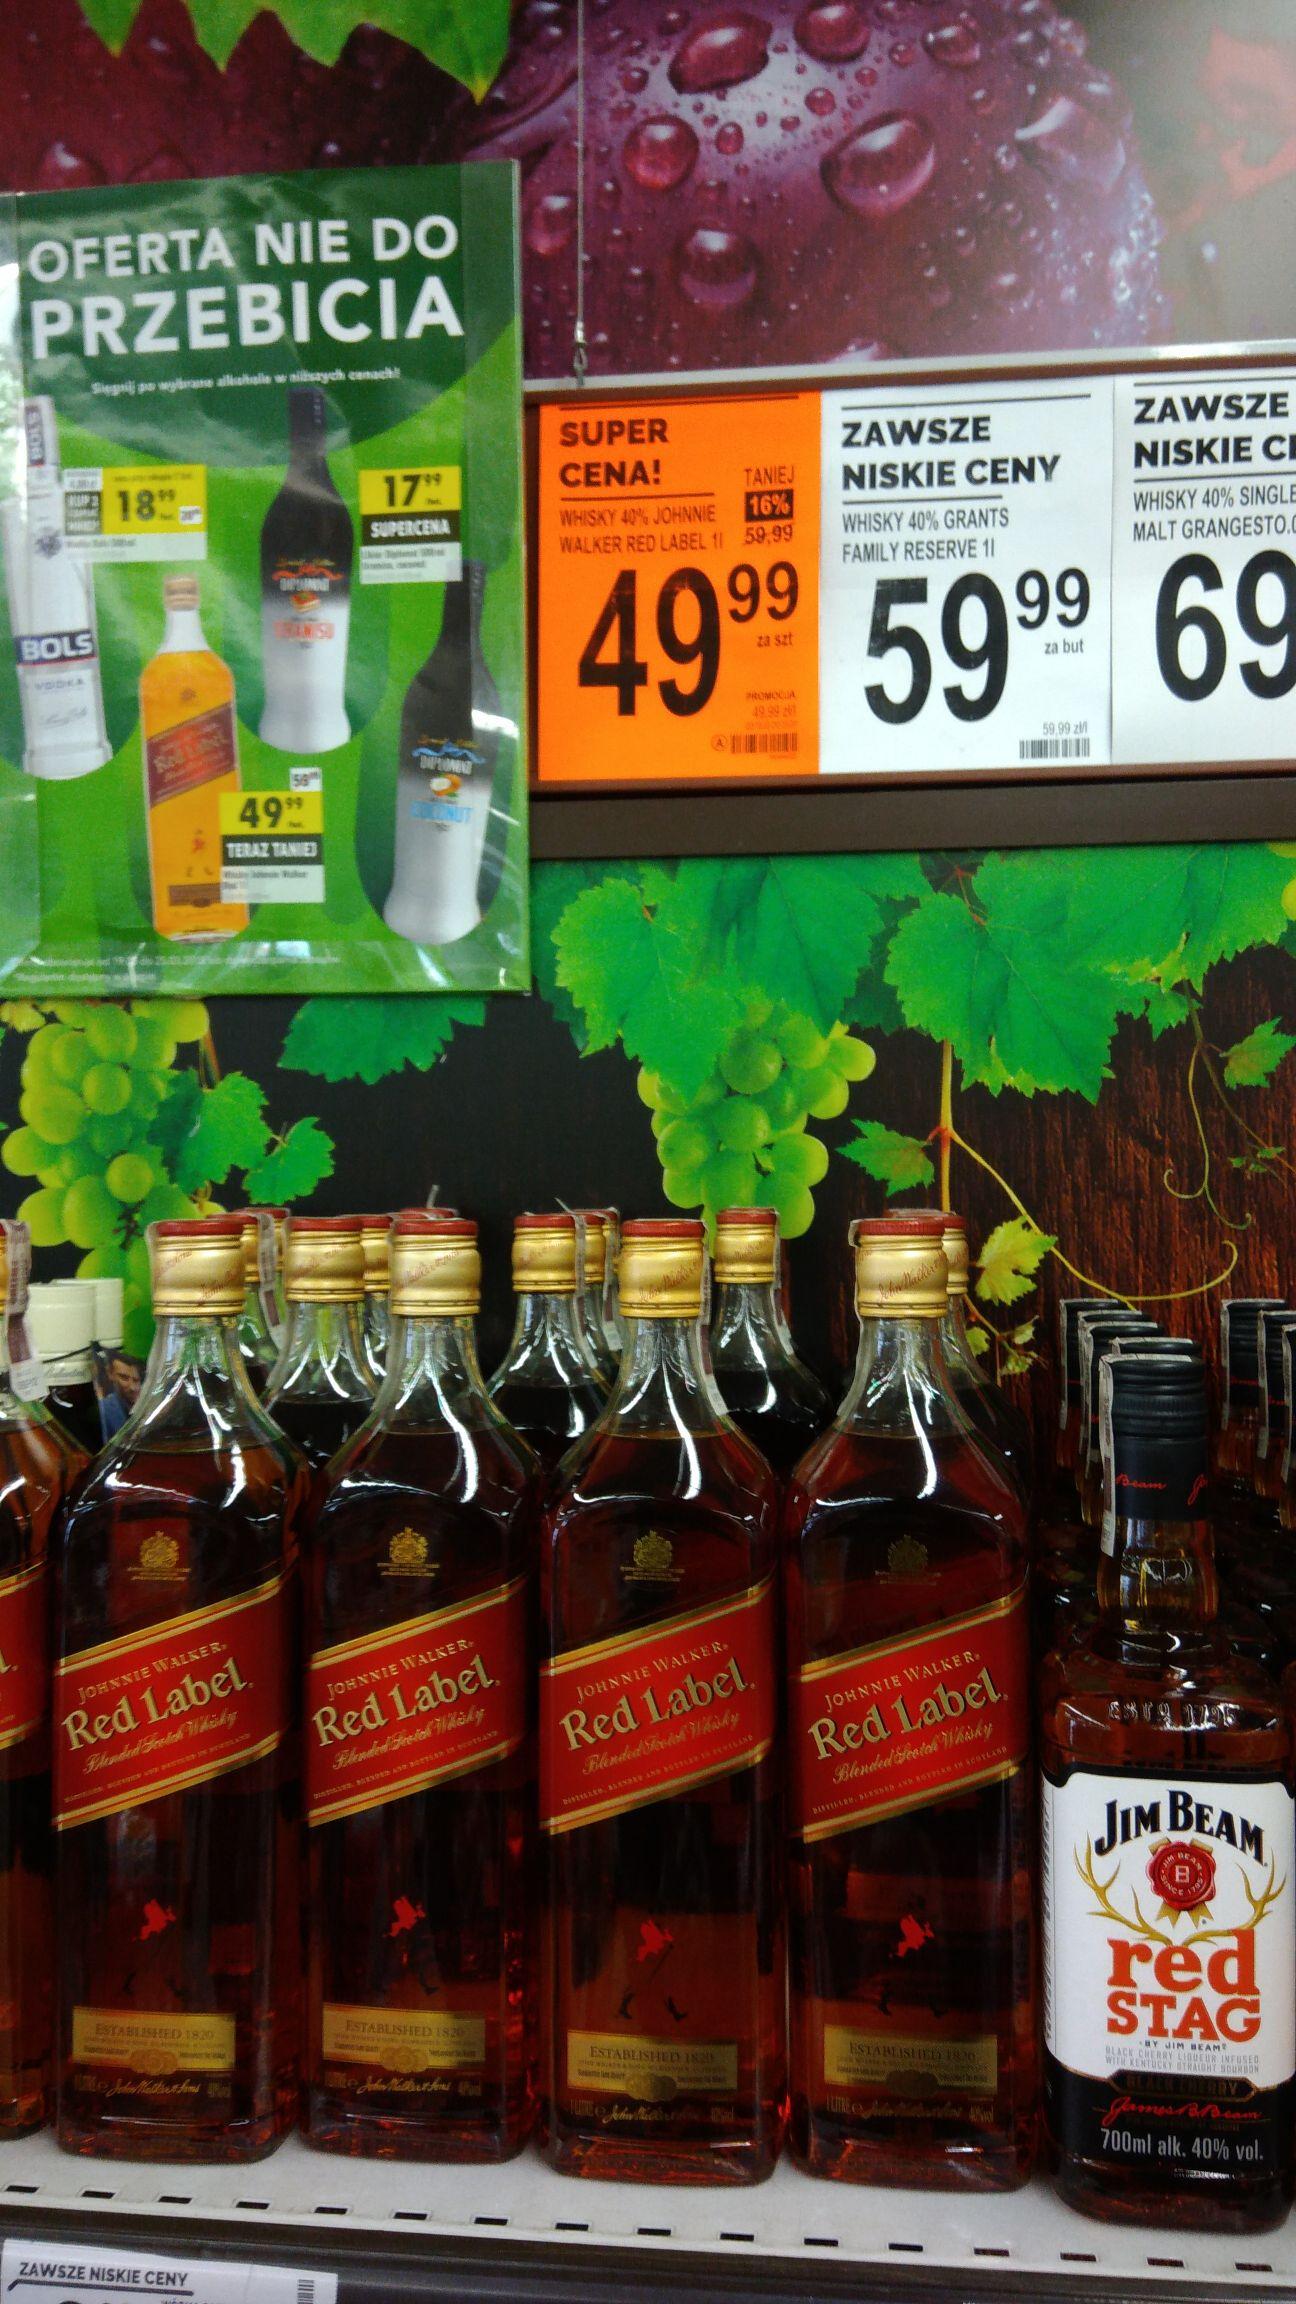 Johnnie Walker red label 1 litr biedronka